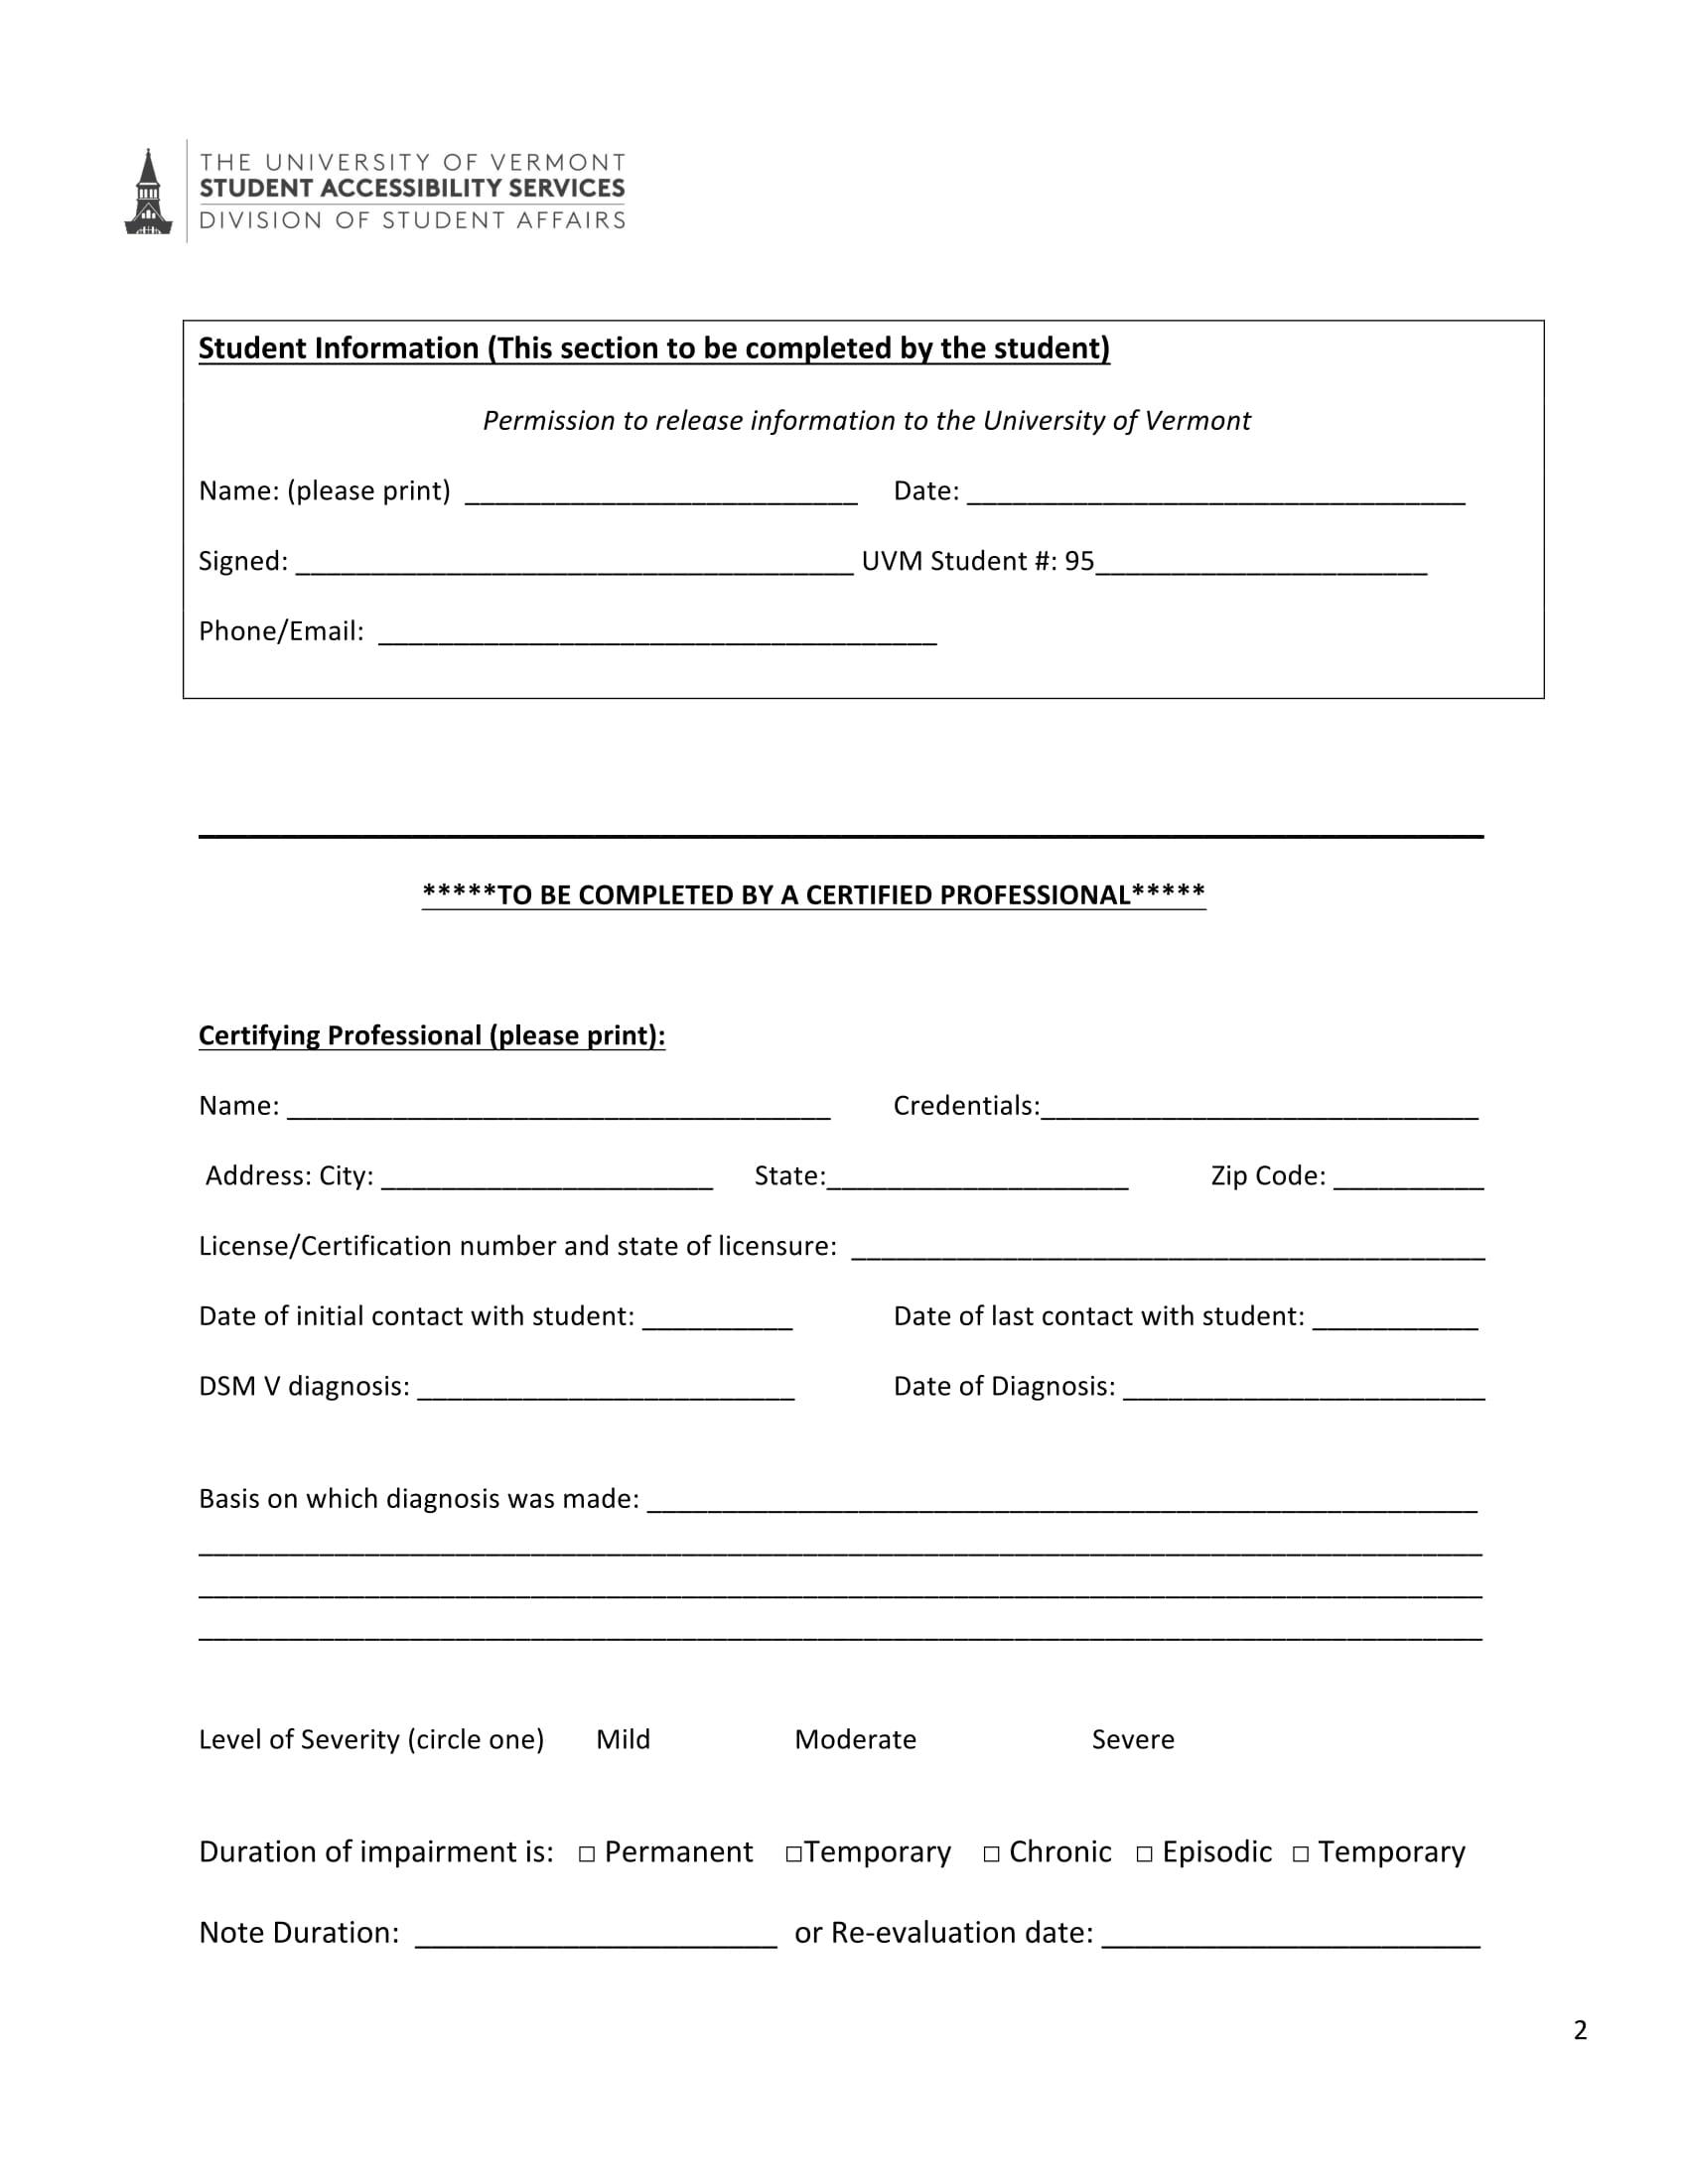 psychological disability verification form 2